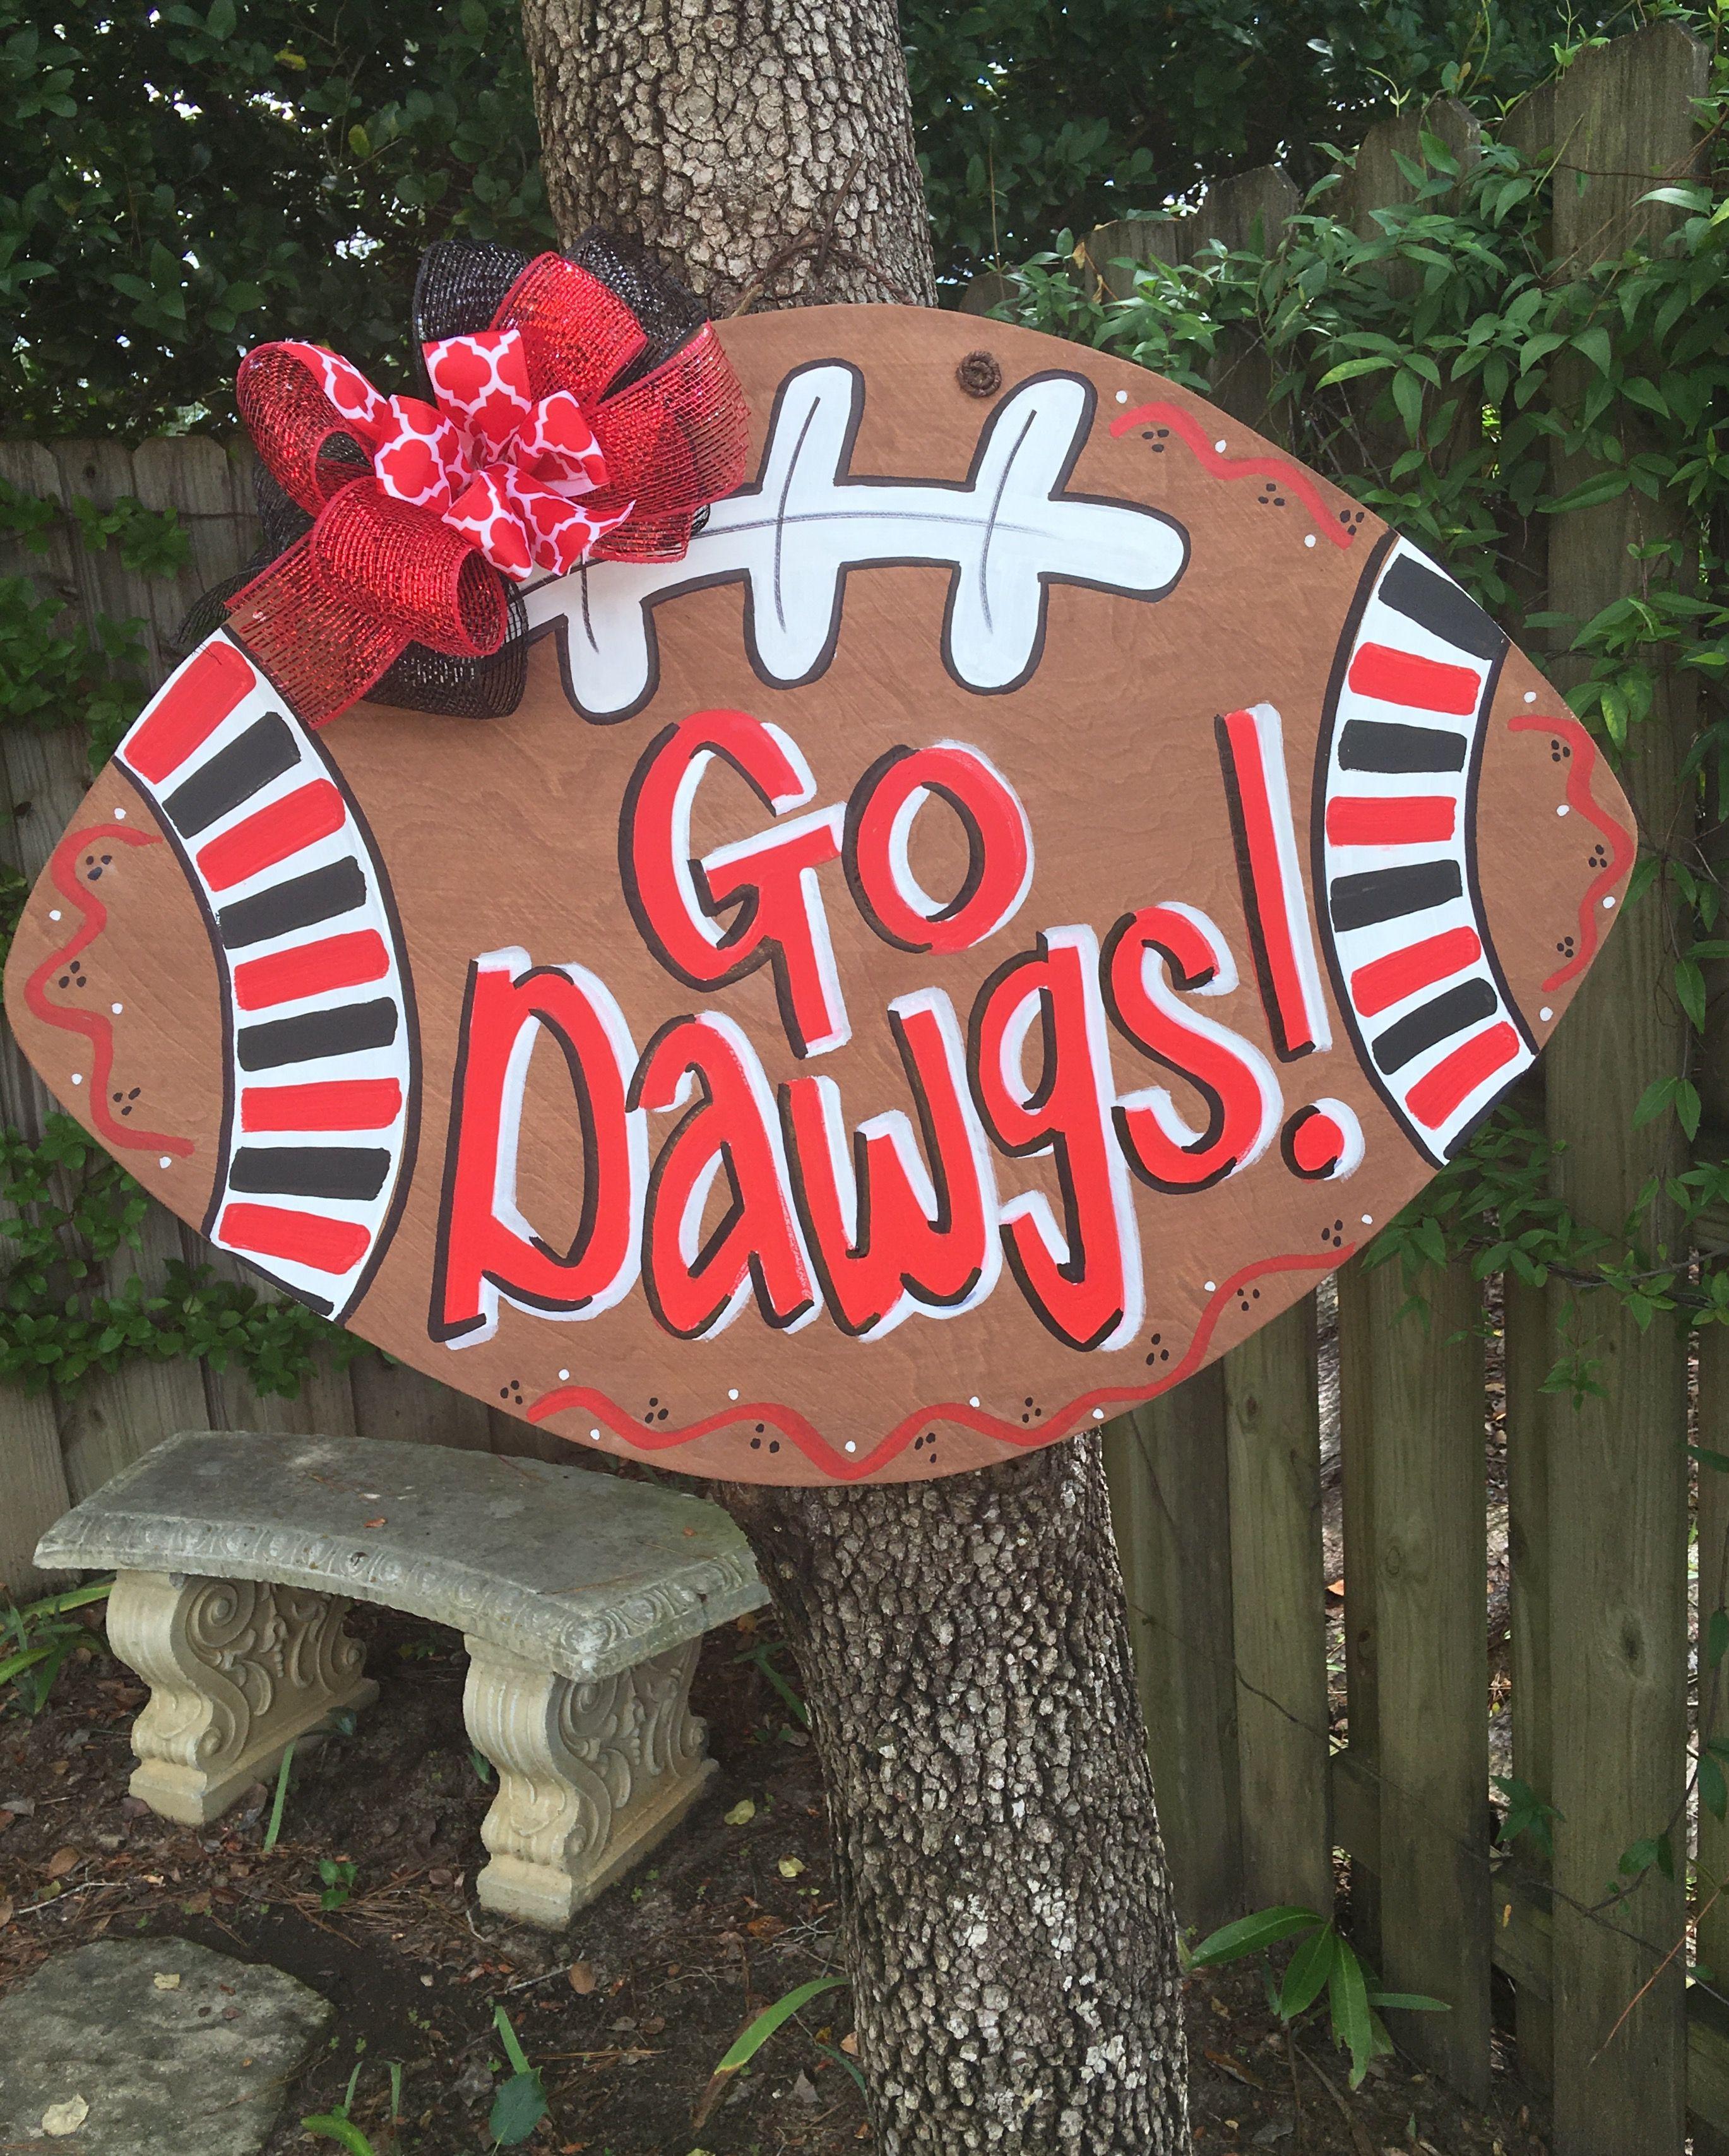 Go Dawgs University Of Georgia Bulldogs Football Door Hanger By Bless Your Heart Art ️